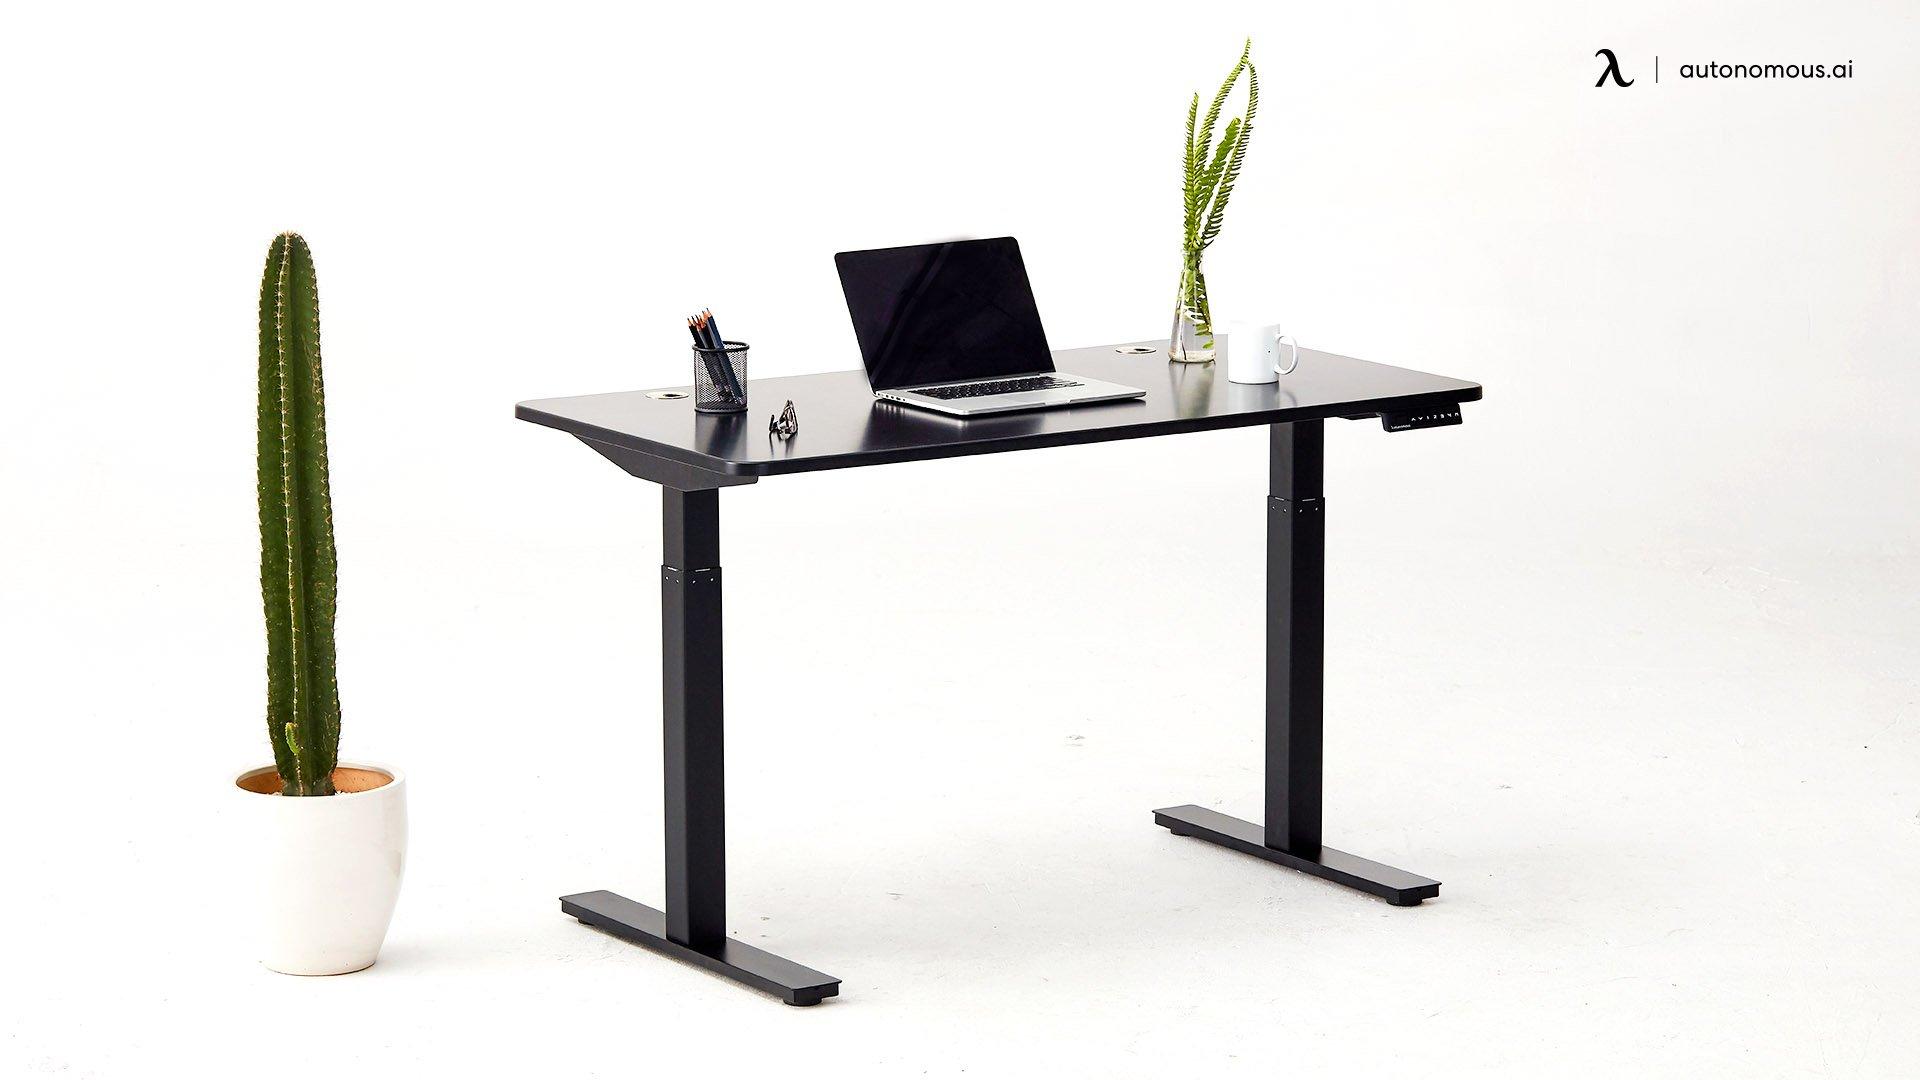 Smart Desk 2 - Home Office